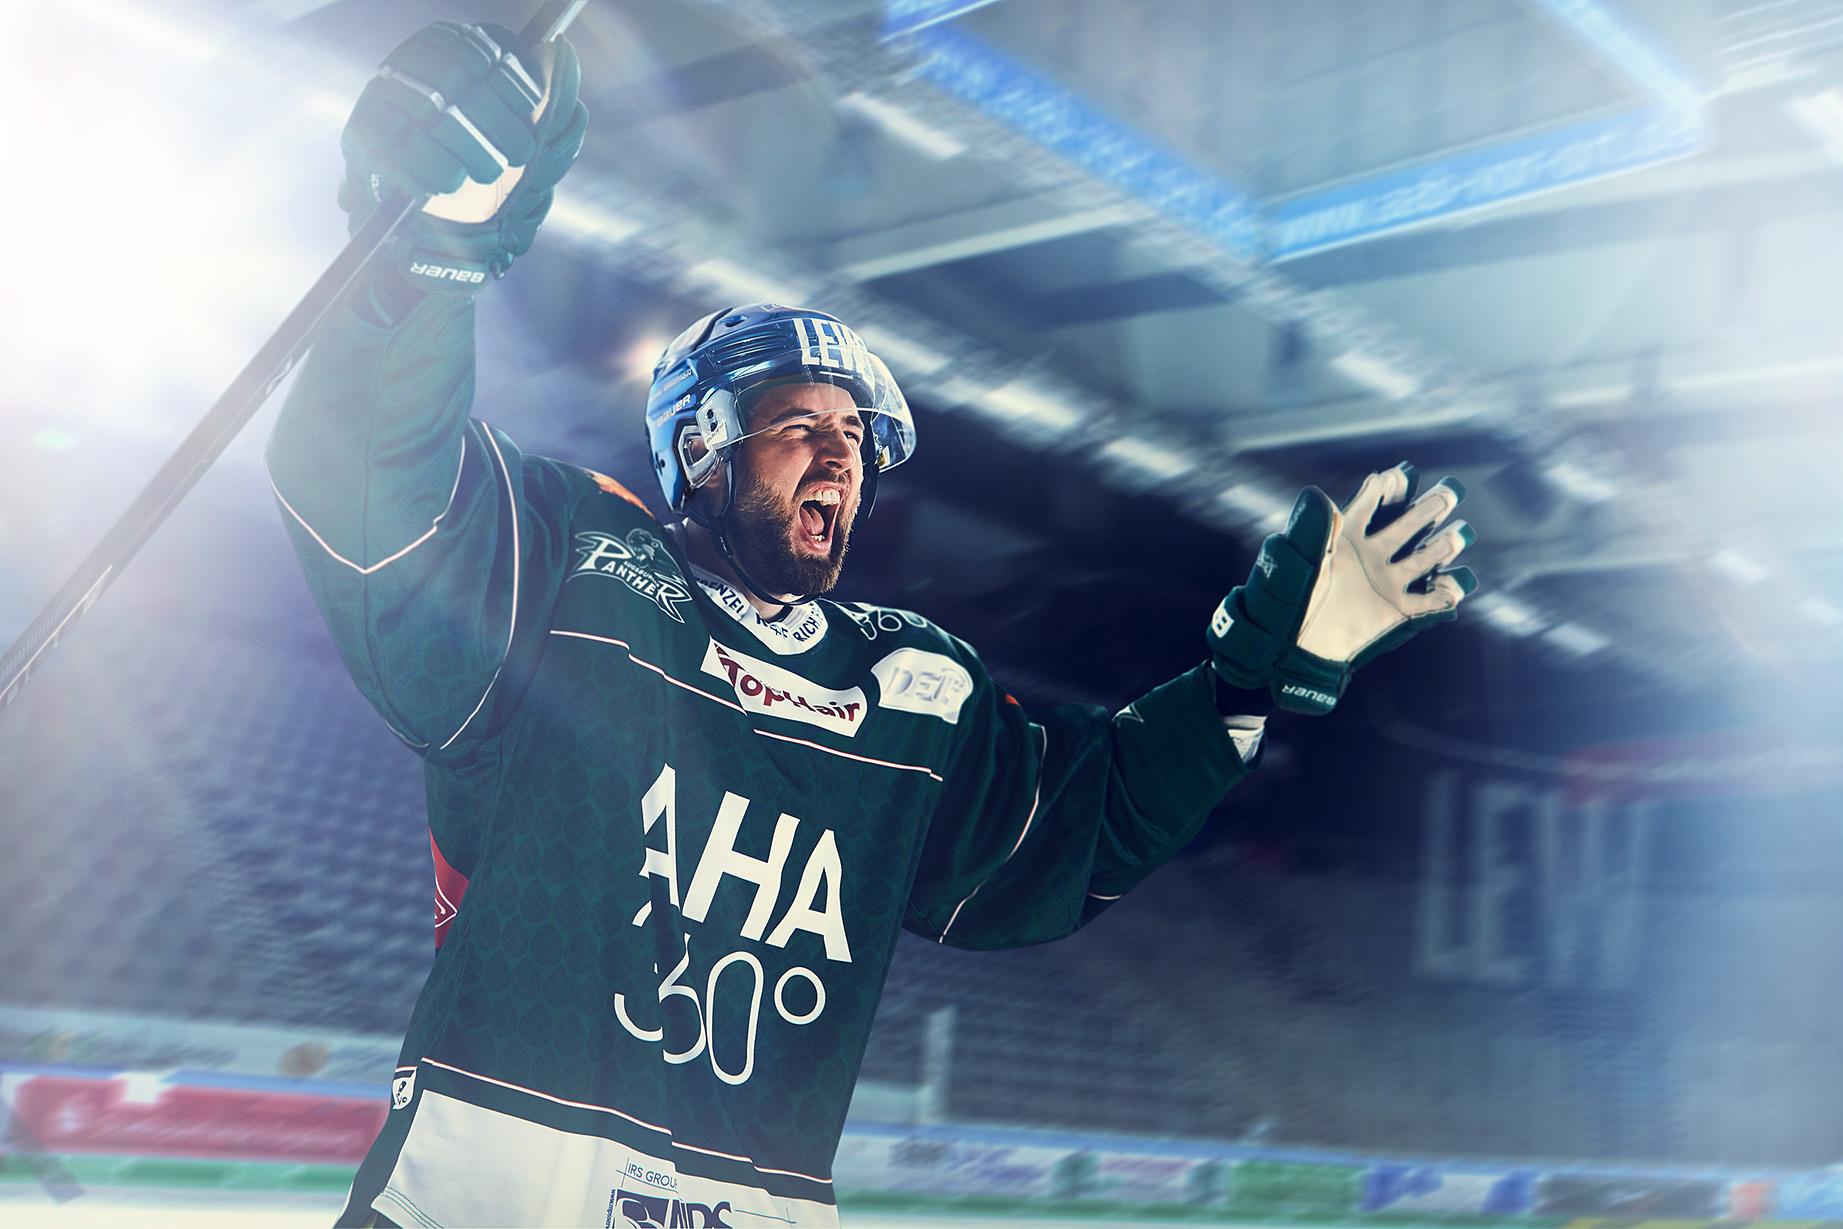 Thomas-Holzmann-Eishockey-Augsburger-Panther.jpg